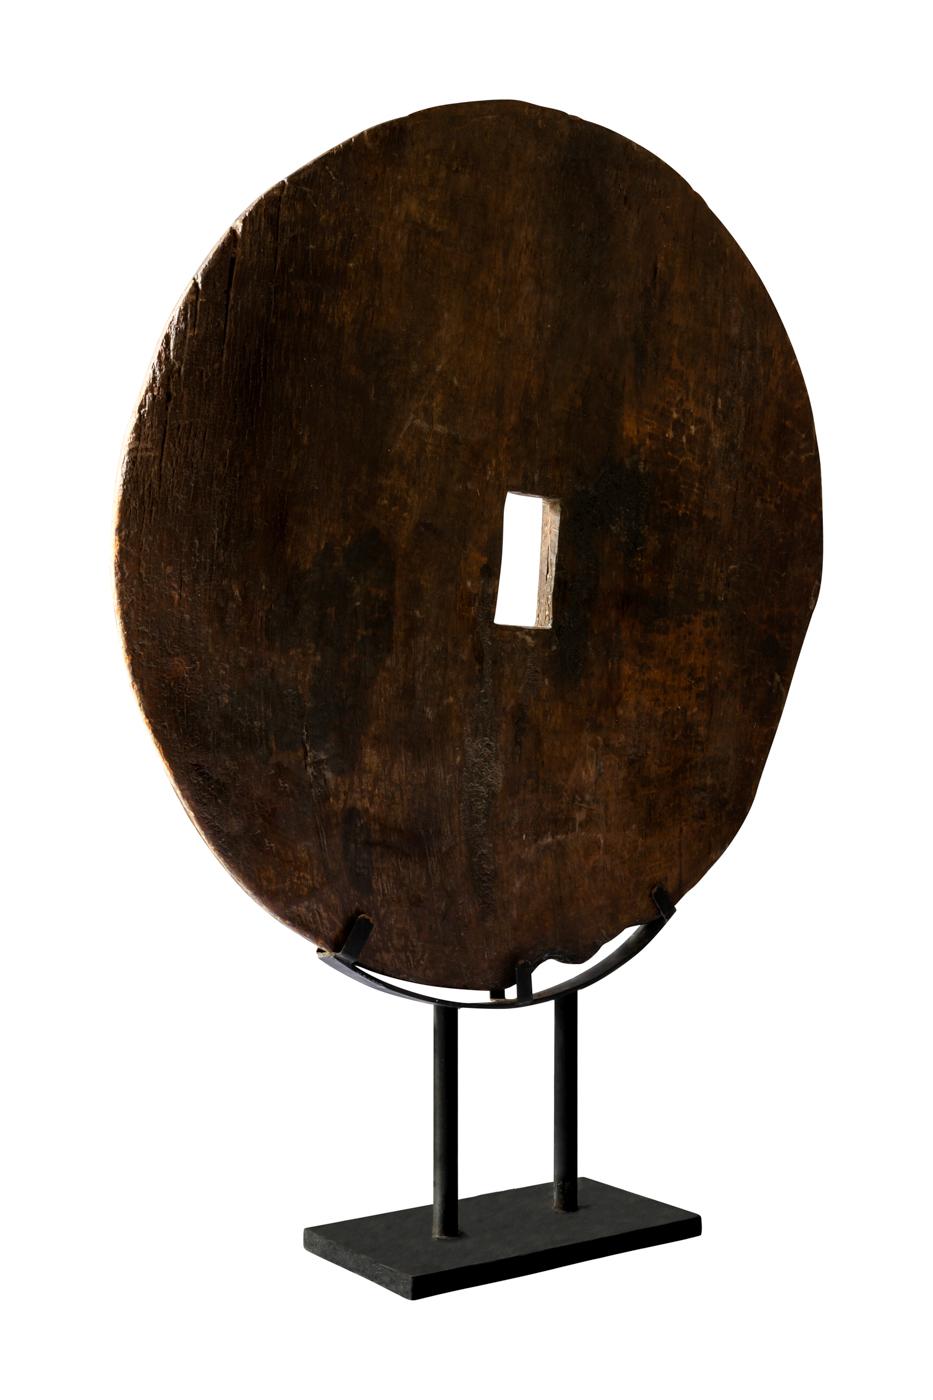 Rueda decorativa en madera sobre base de metal-Café oscuro